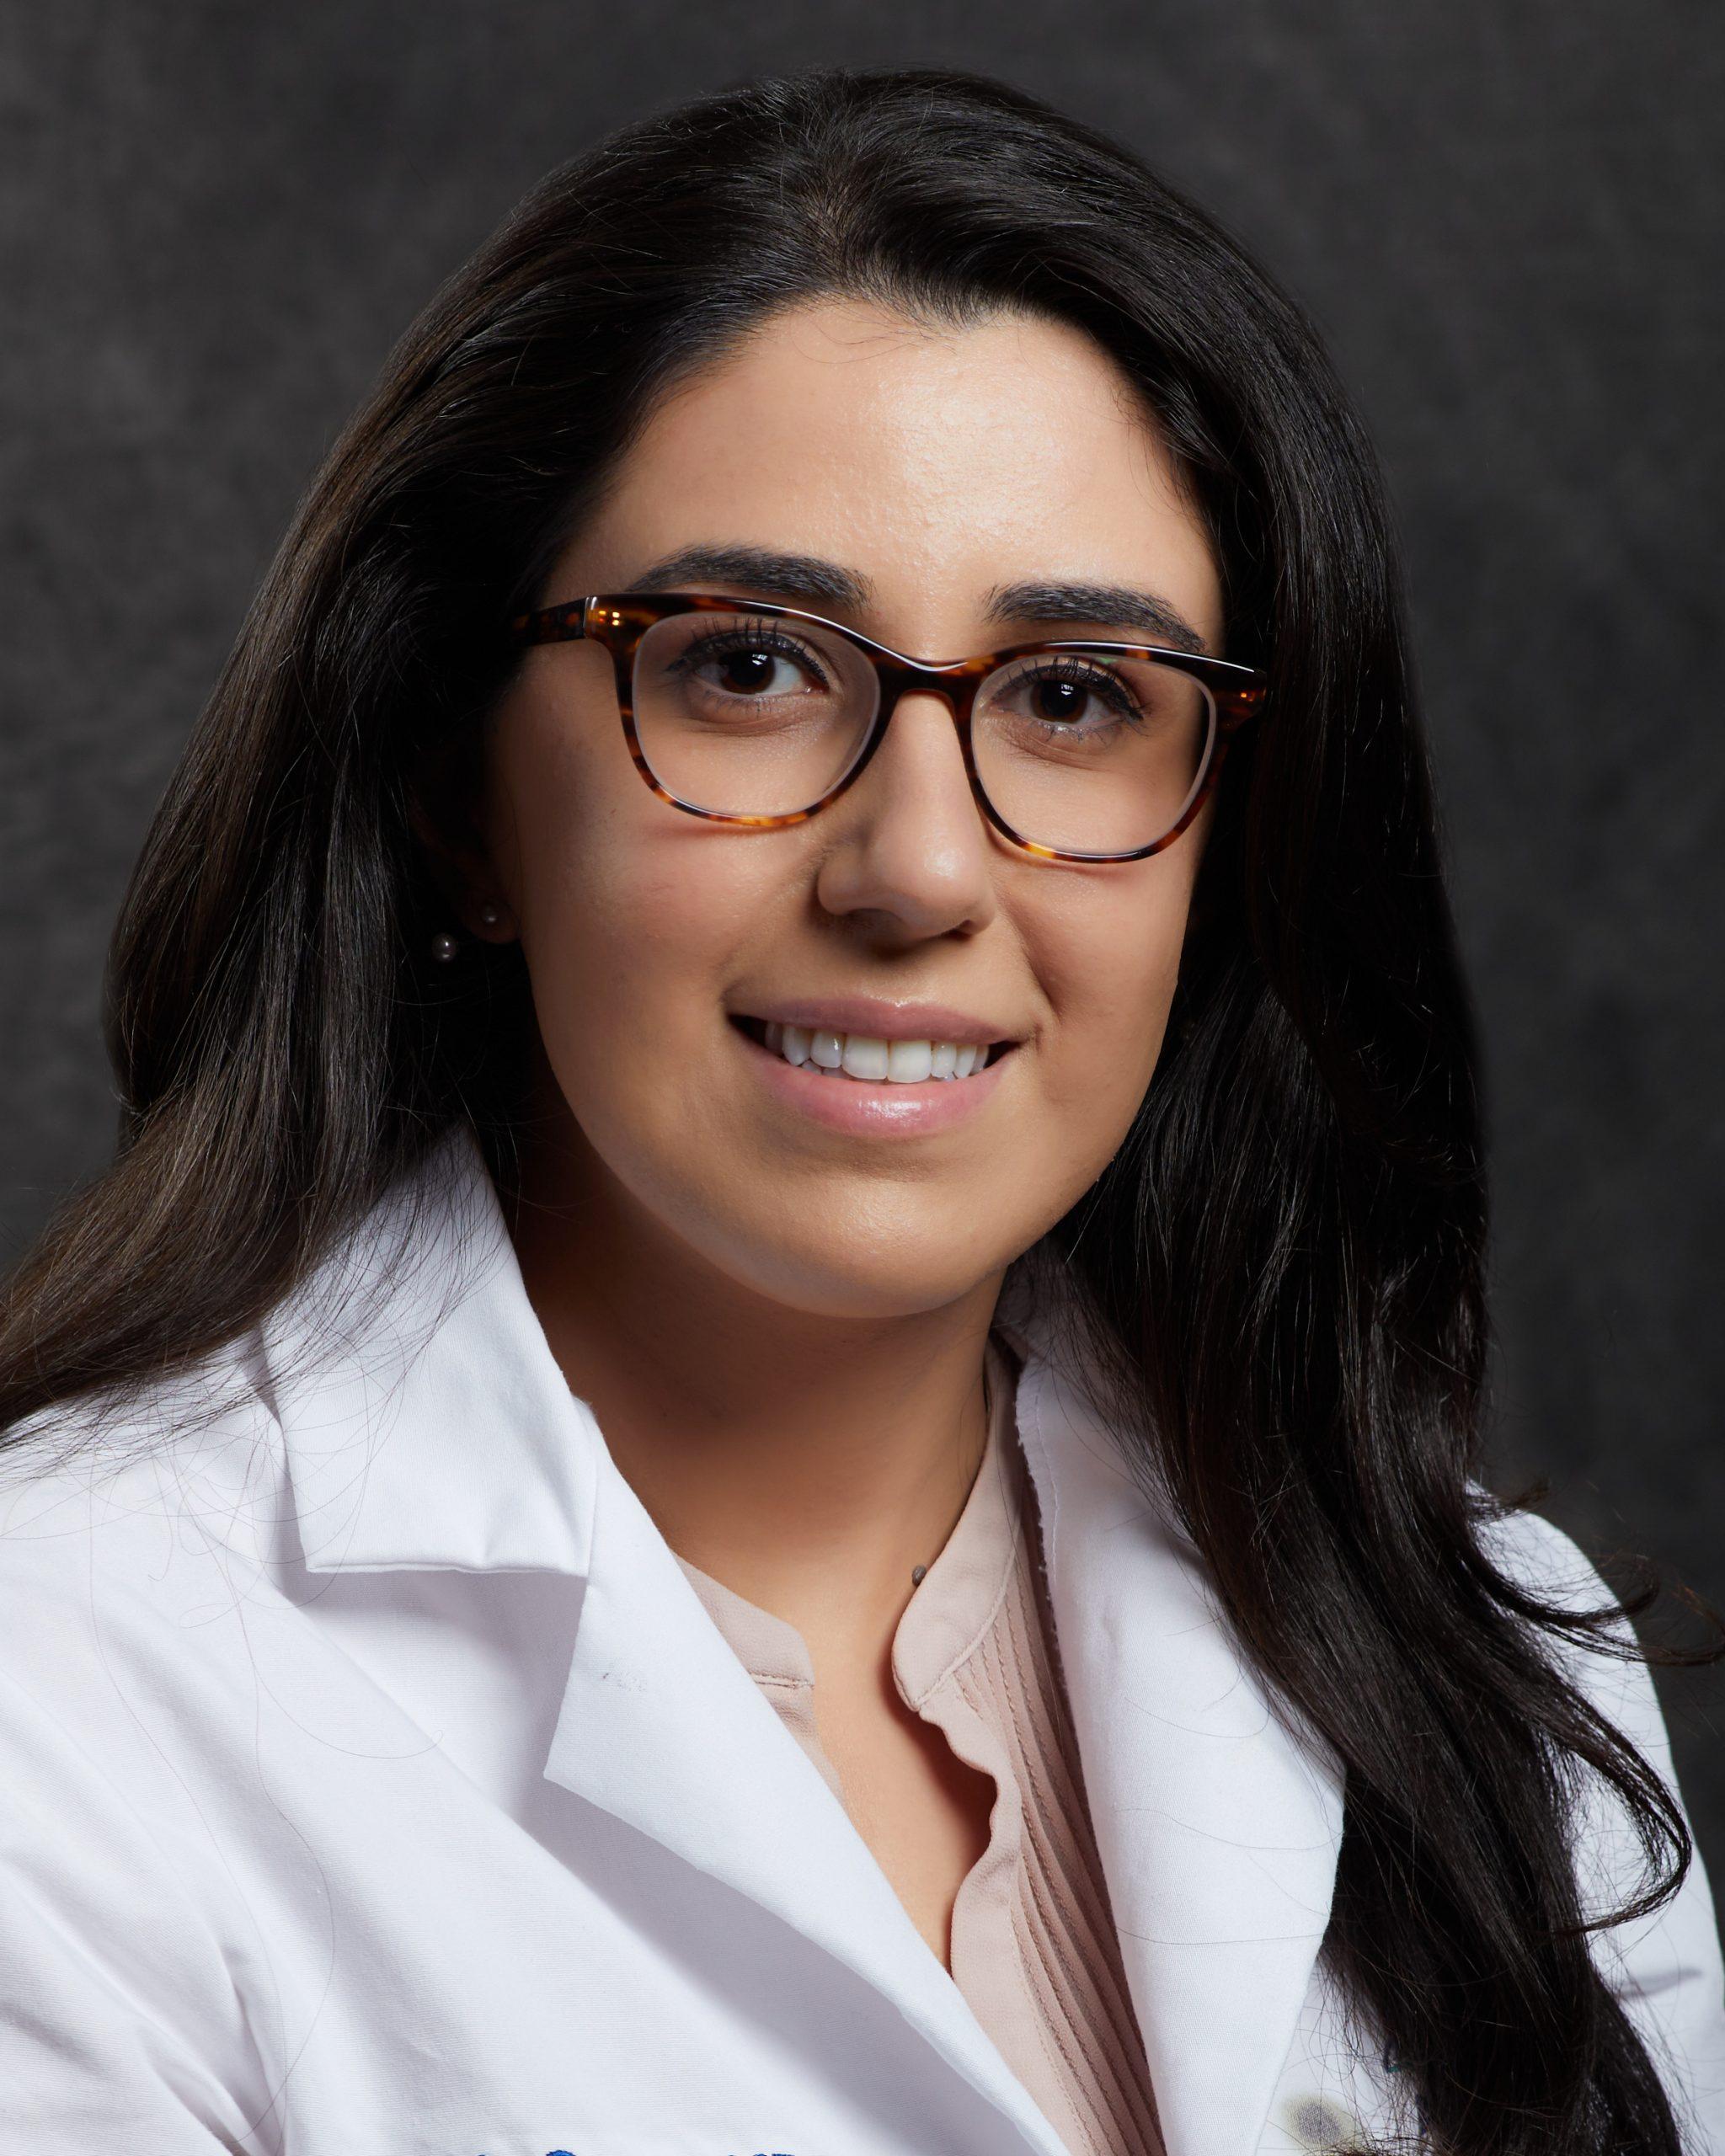 Maryam Somo, MD - An Employed Provider of Memorial Healthcare